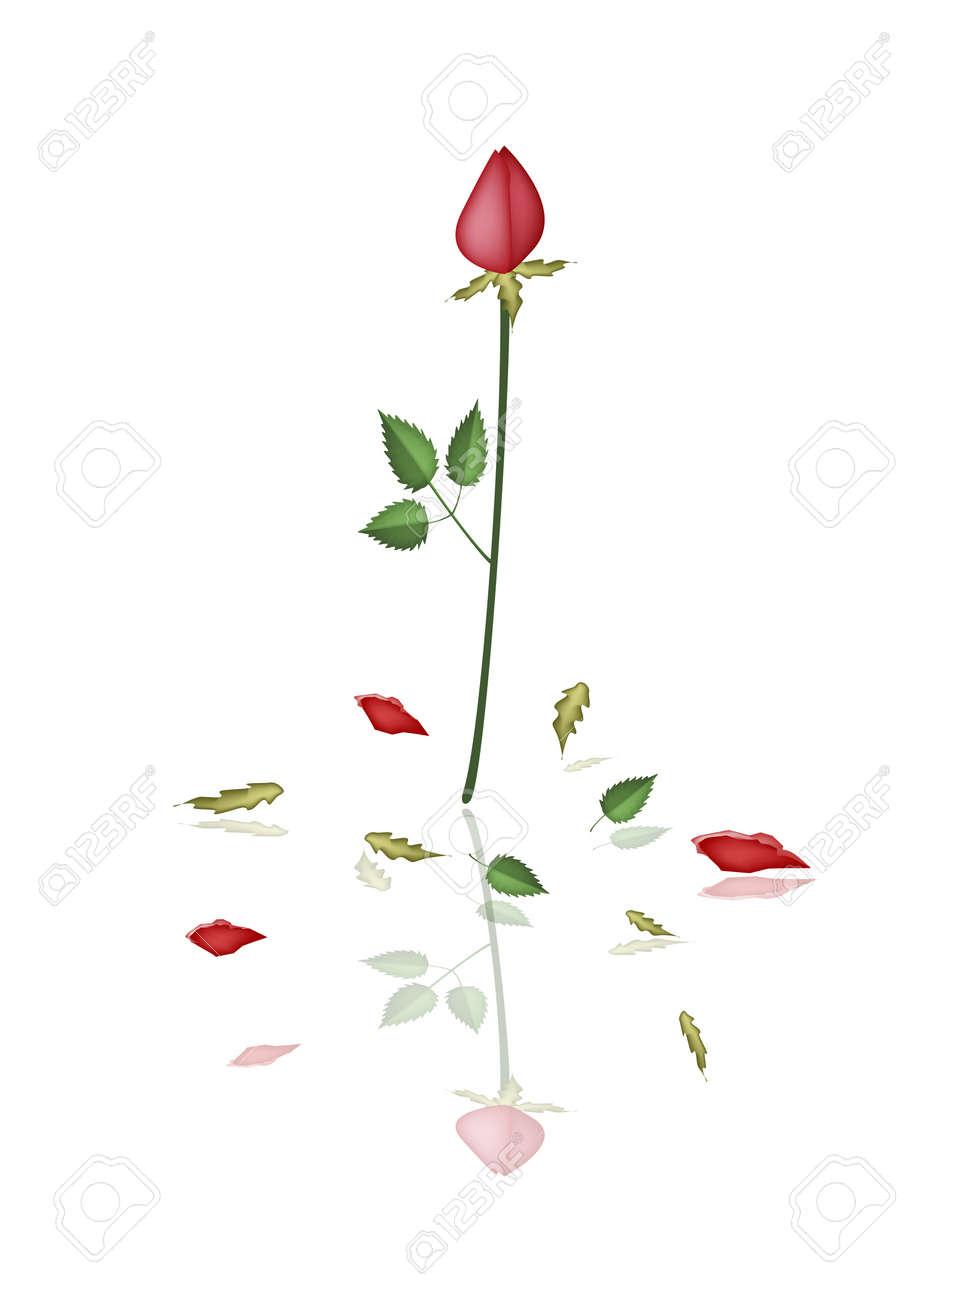 A symbol of love illustration of a beautiful red roses for a symbol of love illustration of a beautiful red roses for someone special in valentine buycottarizona